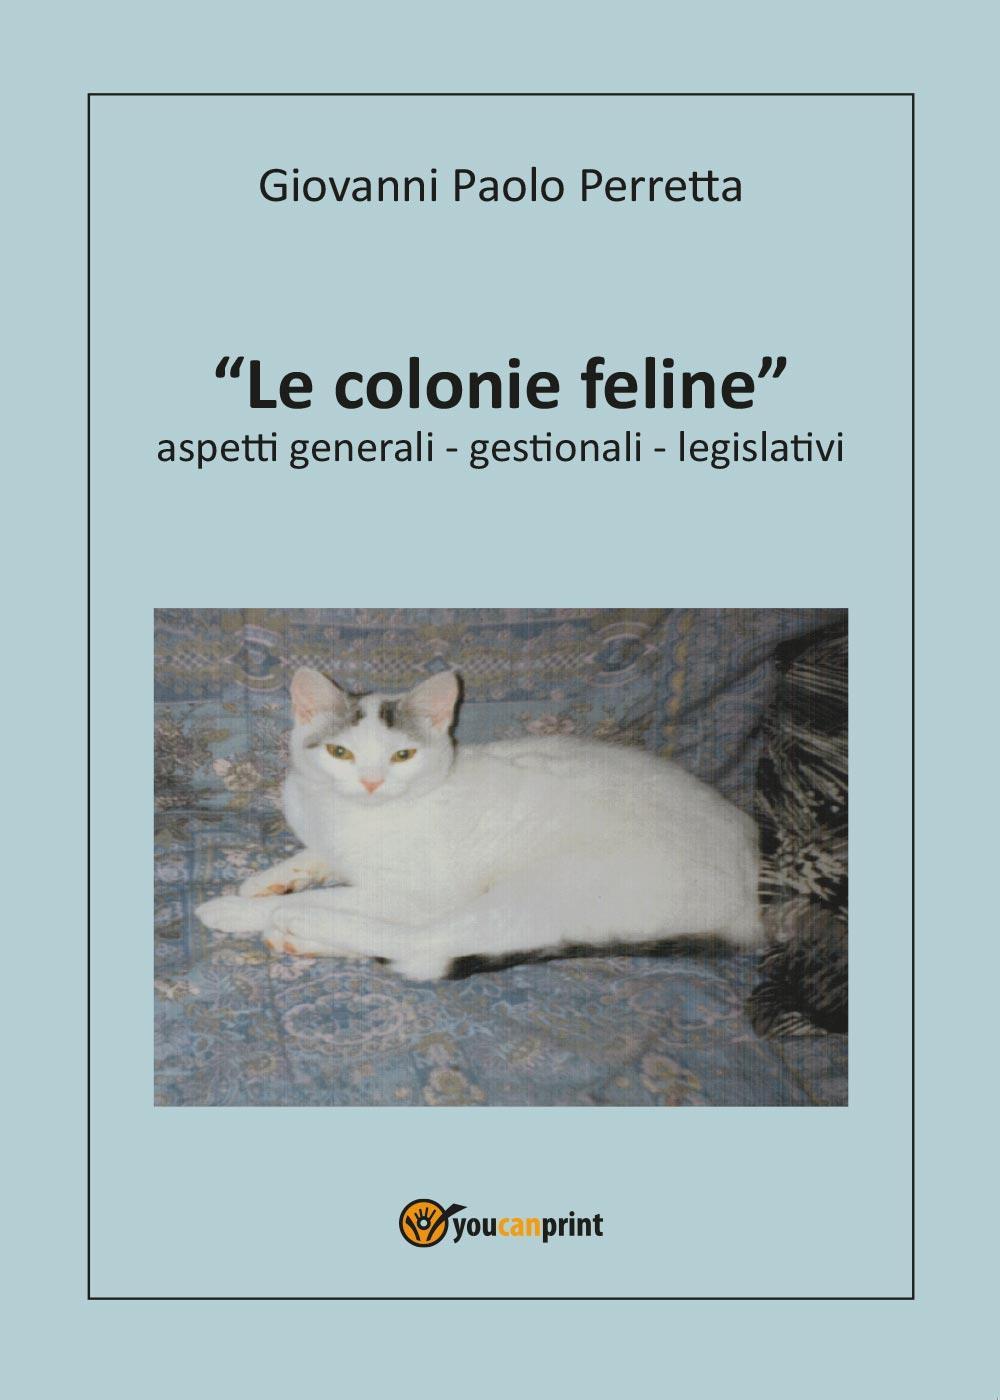 Le colonie feline aspetti generali, gestionali, legislativi